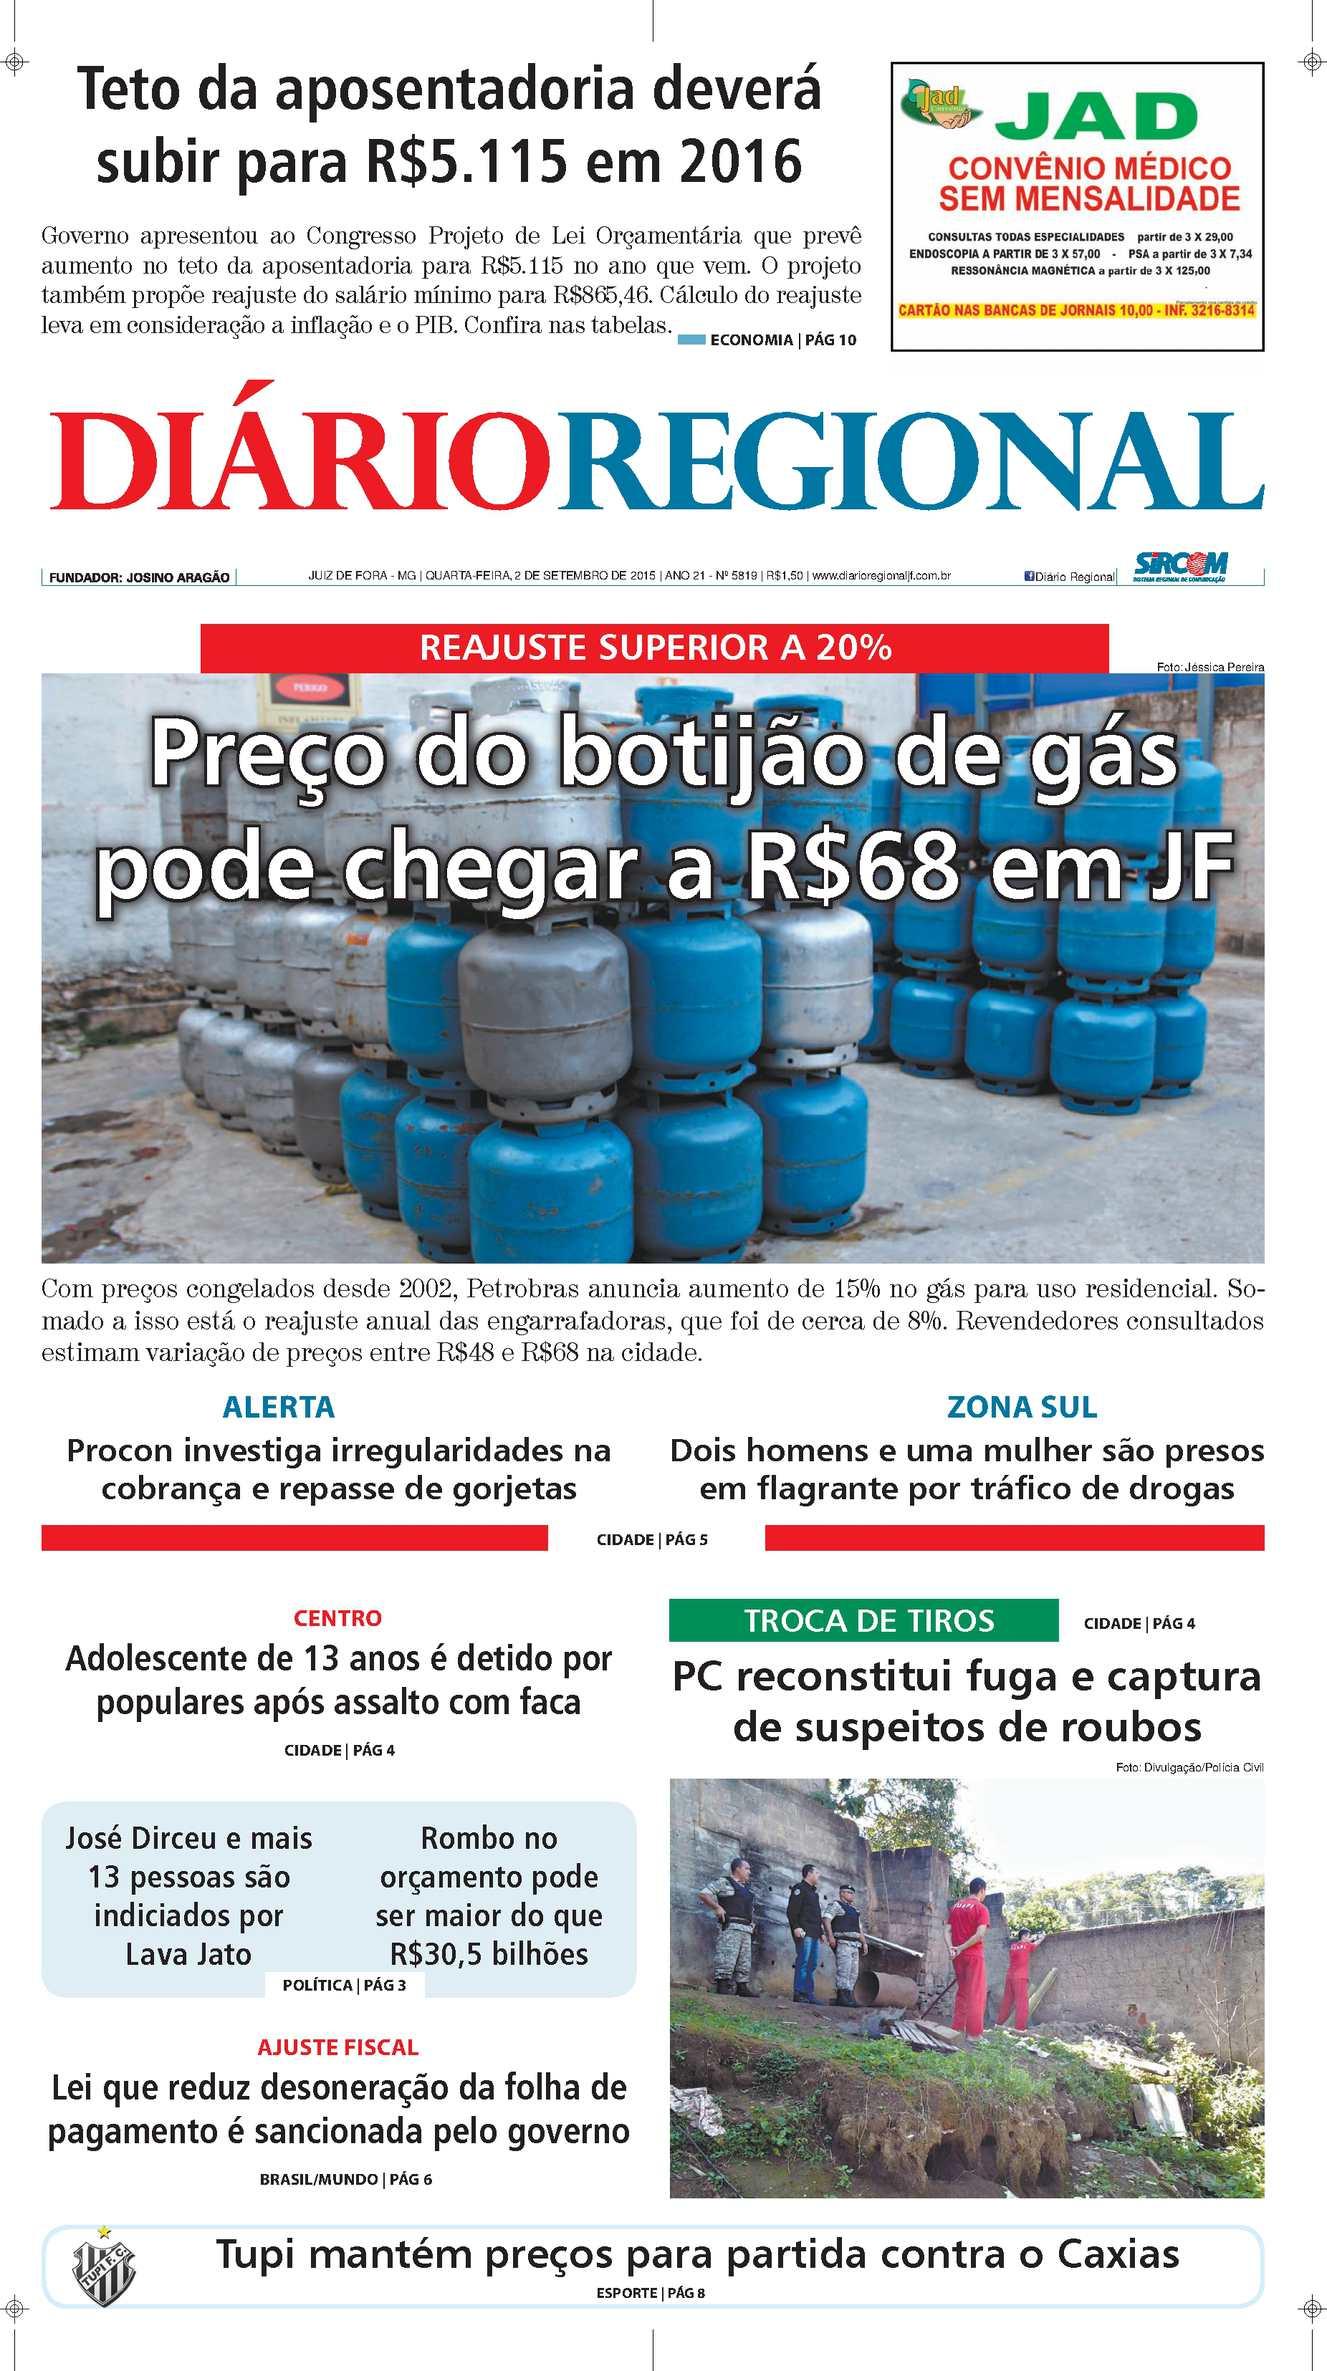 Calaméo - Jornal Site 2 9 15 aae86eb9d5515